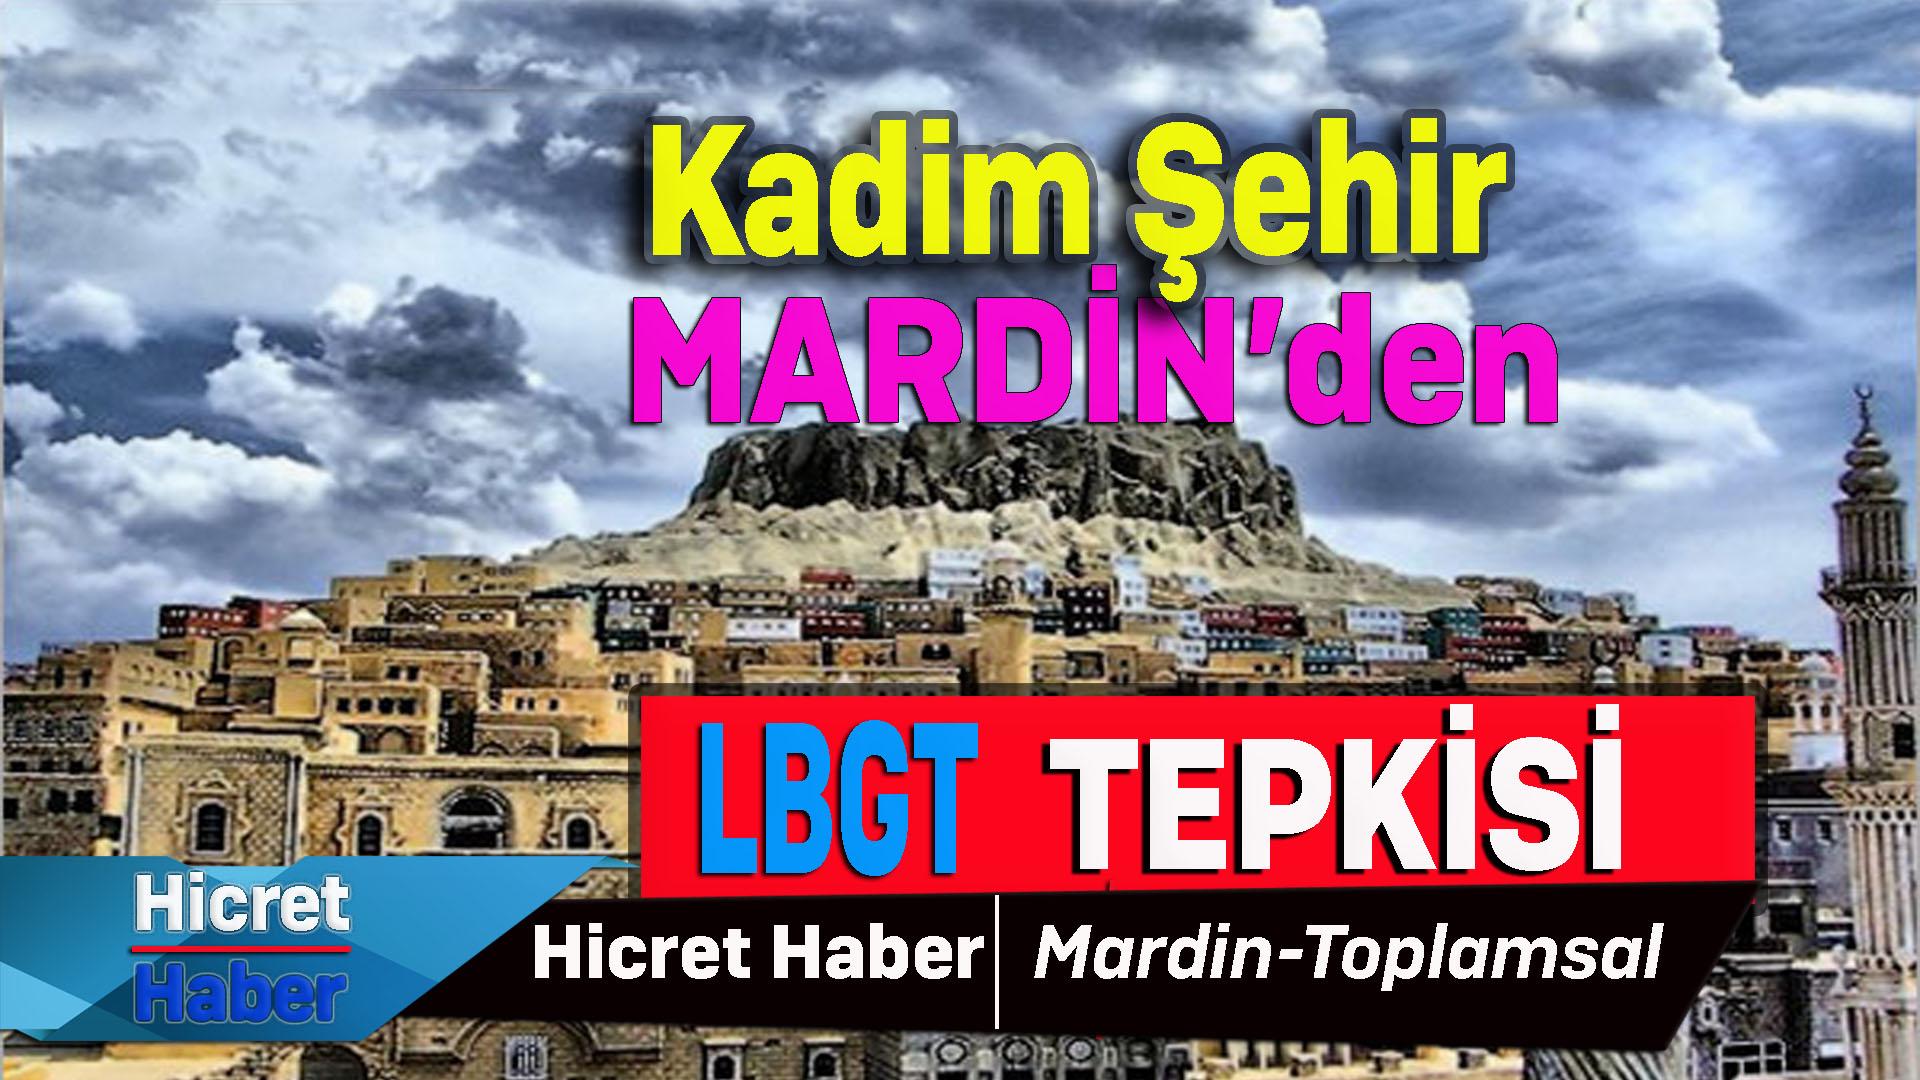 Kadim Şehir Mardin'den LBGT Tepkisi